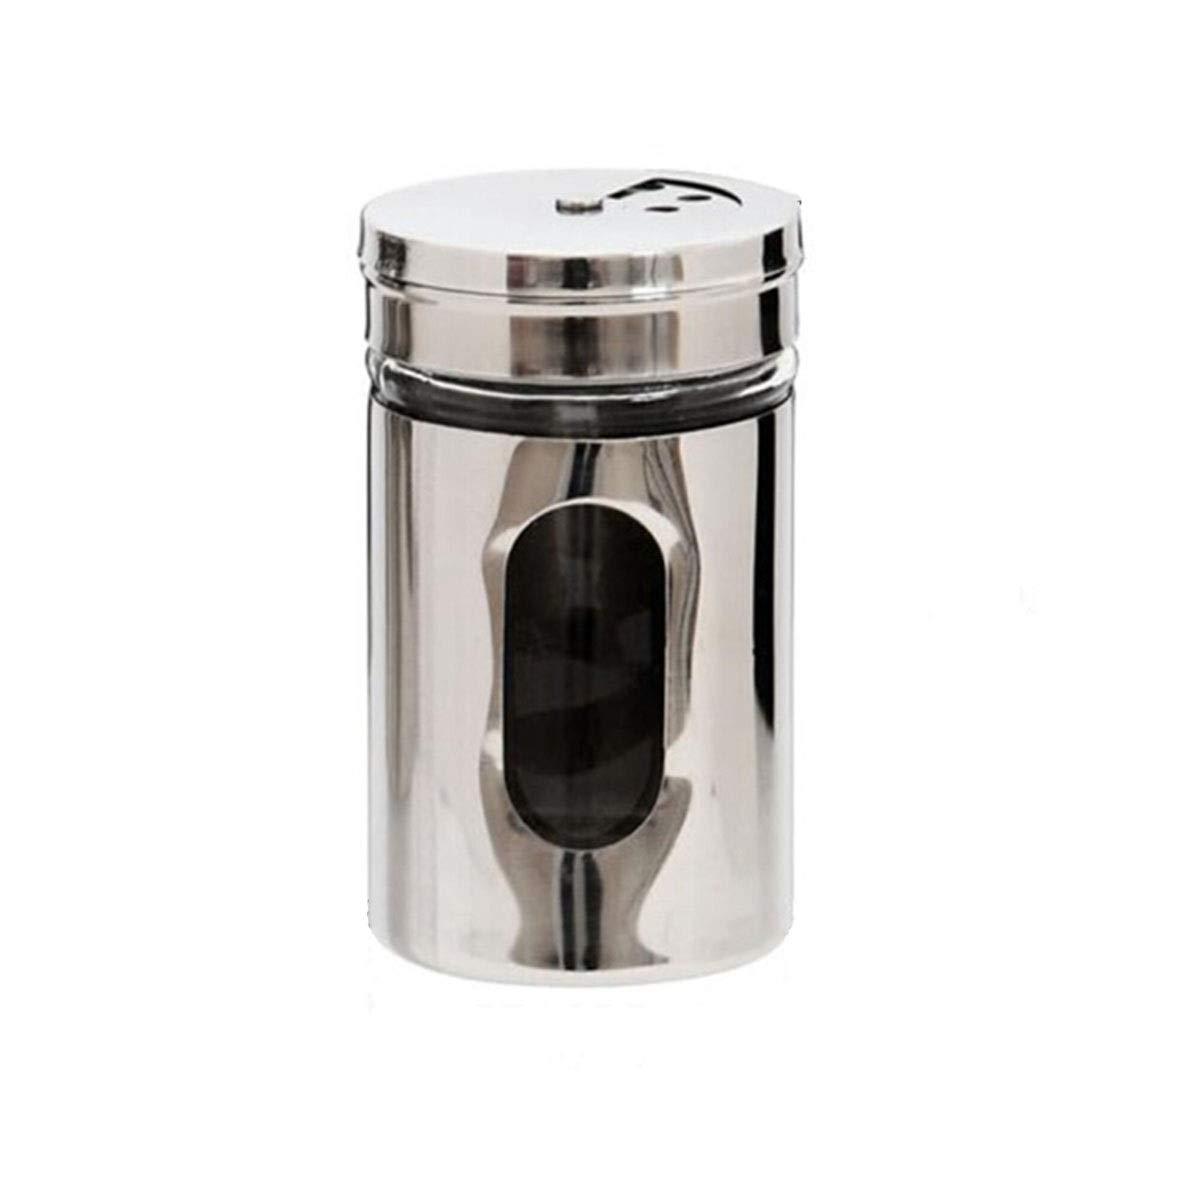 MINGRUIGONGMAO Spice Shaker, Stainless Steel Lided Seasoning Jar, Perforated Seasoning Box, Kitchen Seasoning Jar, Seasoning Seasoning Bottle (one Pack) Plush toys (Color : Silver) by MINGRUIGONGMAO